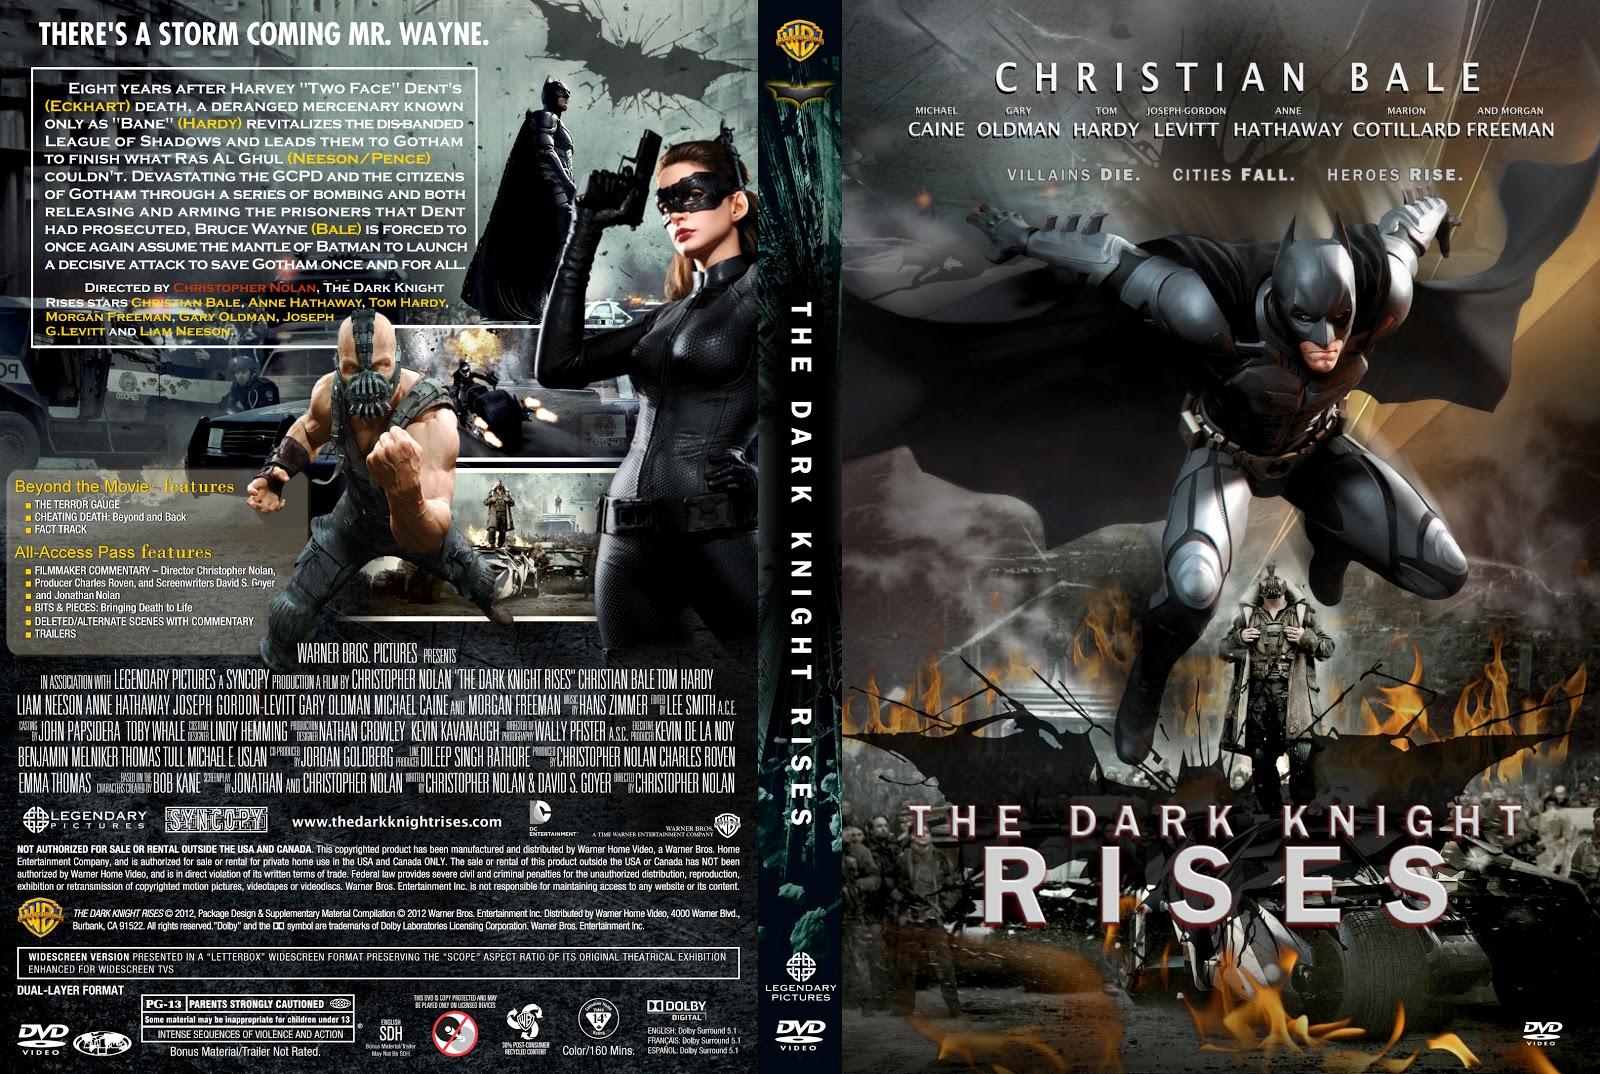 Batman: El Caballero de la Noche Asciende (2012) - Identi